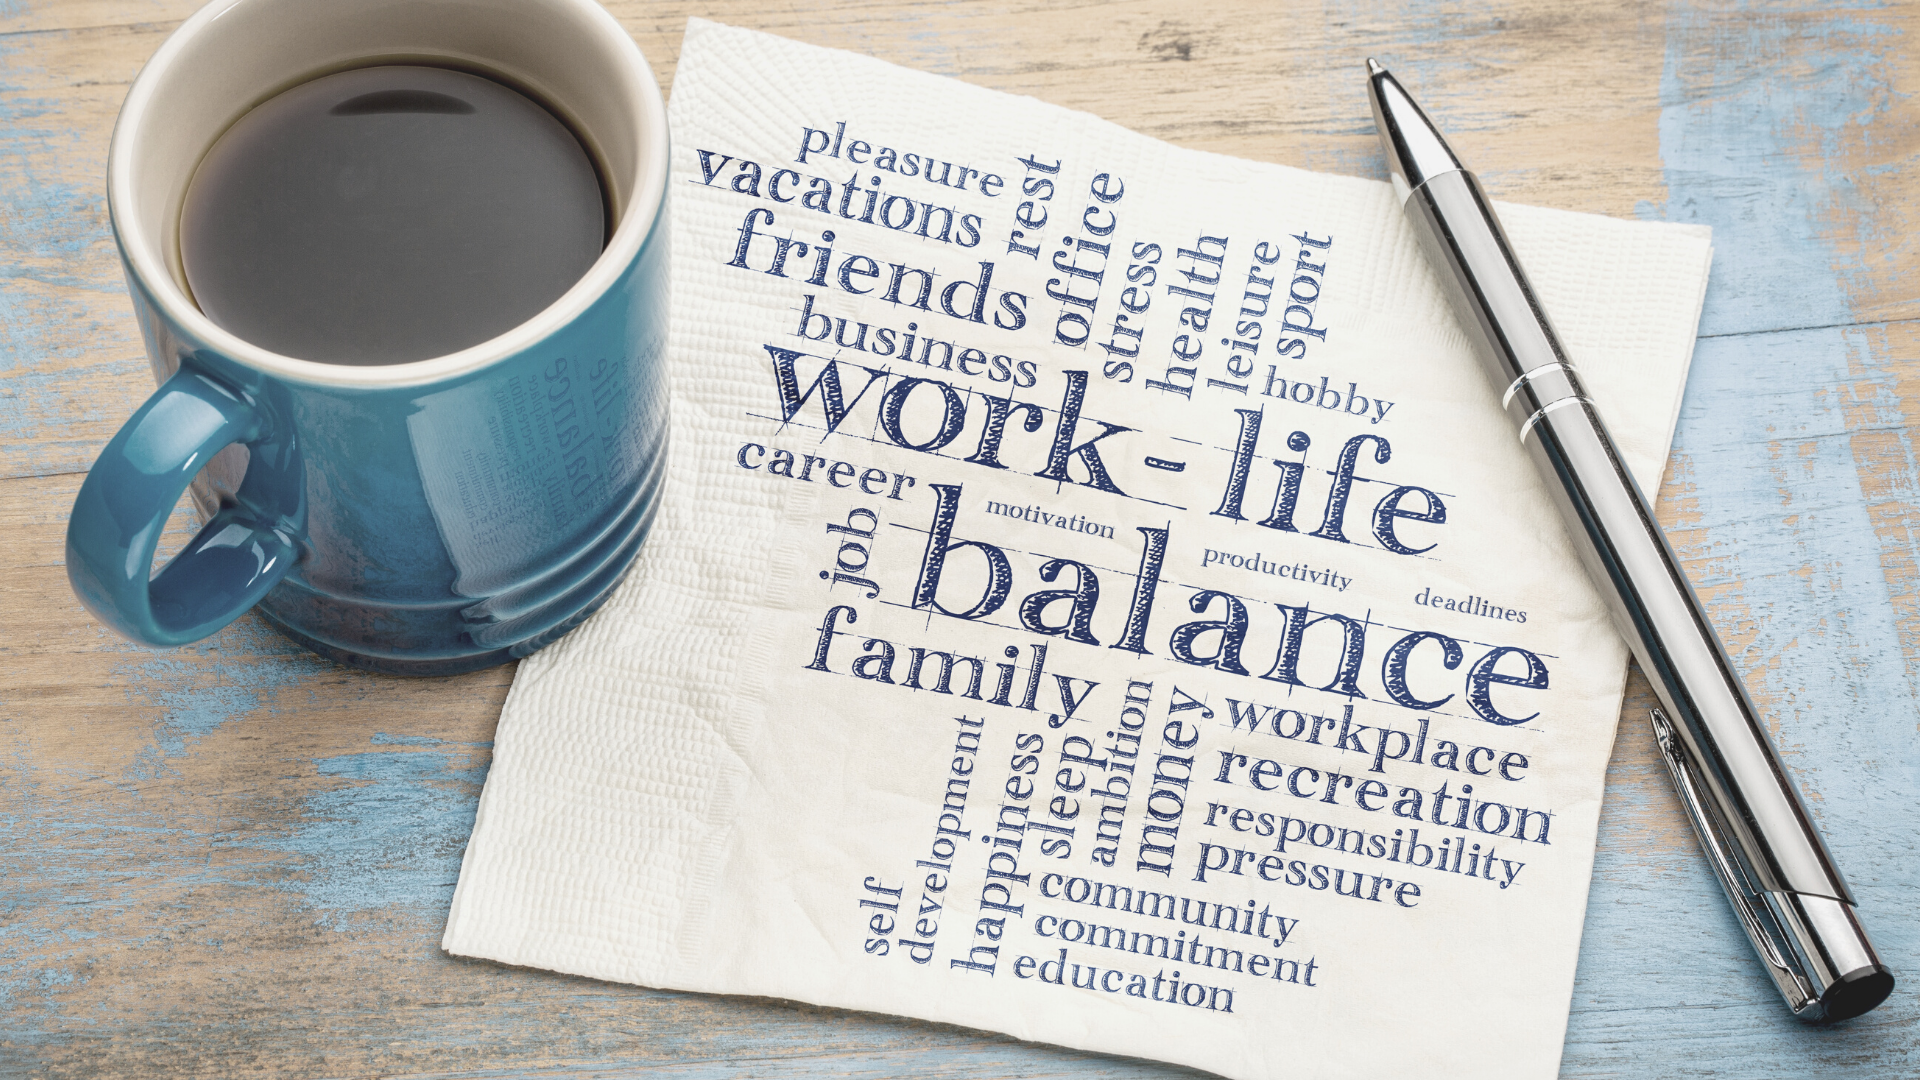 work-life balance 2